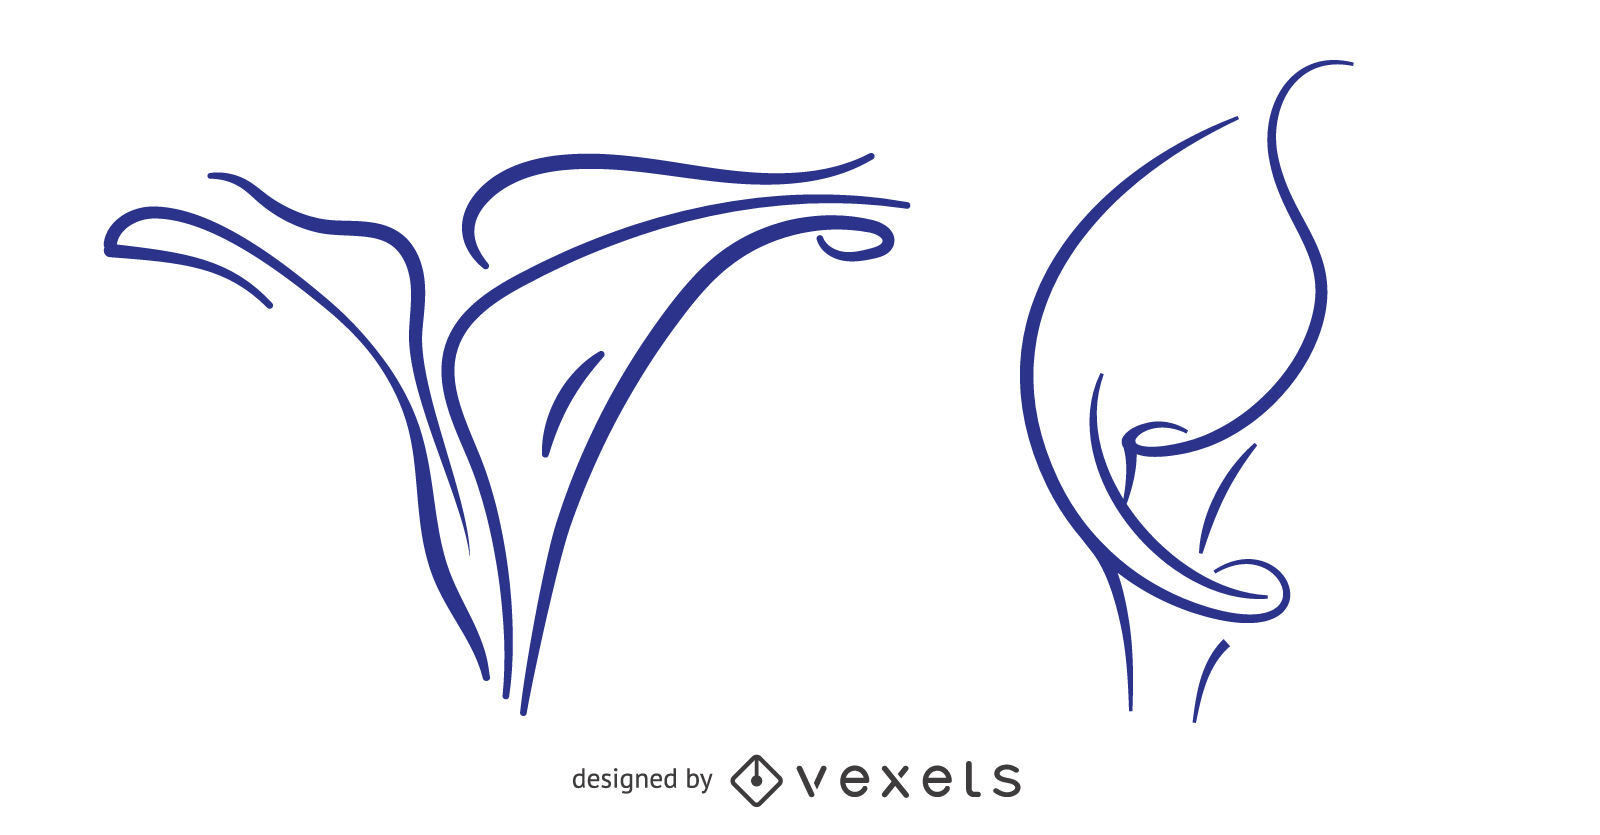 Diseño de trazo de lirio de cala